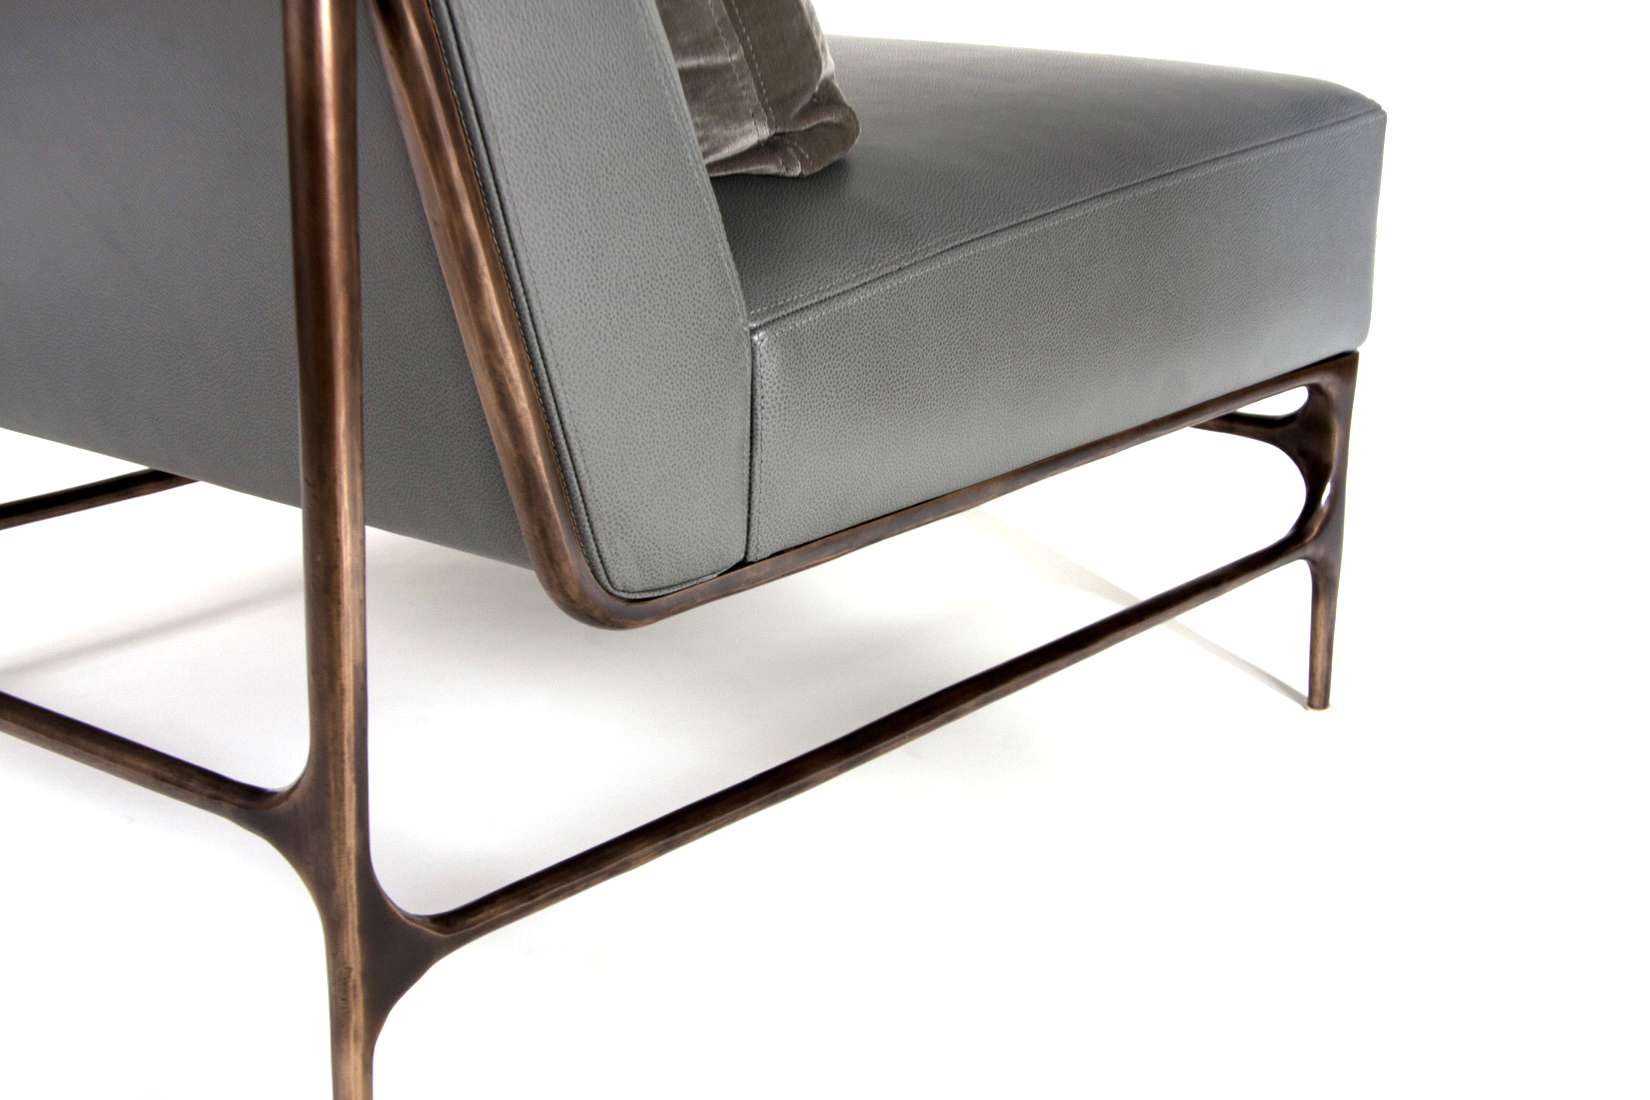 ELLIOT-EAKIN-Furniture-Crane-Slipper-Chair-Rear-Detail-View.jpg